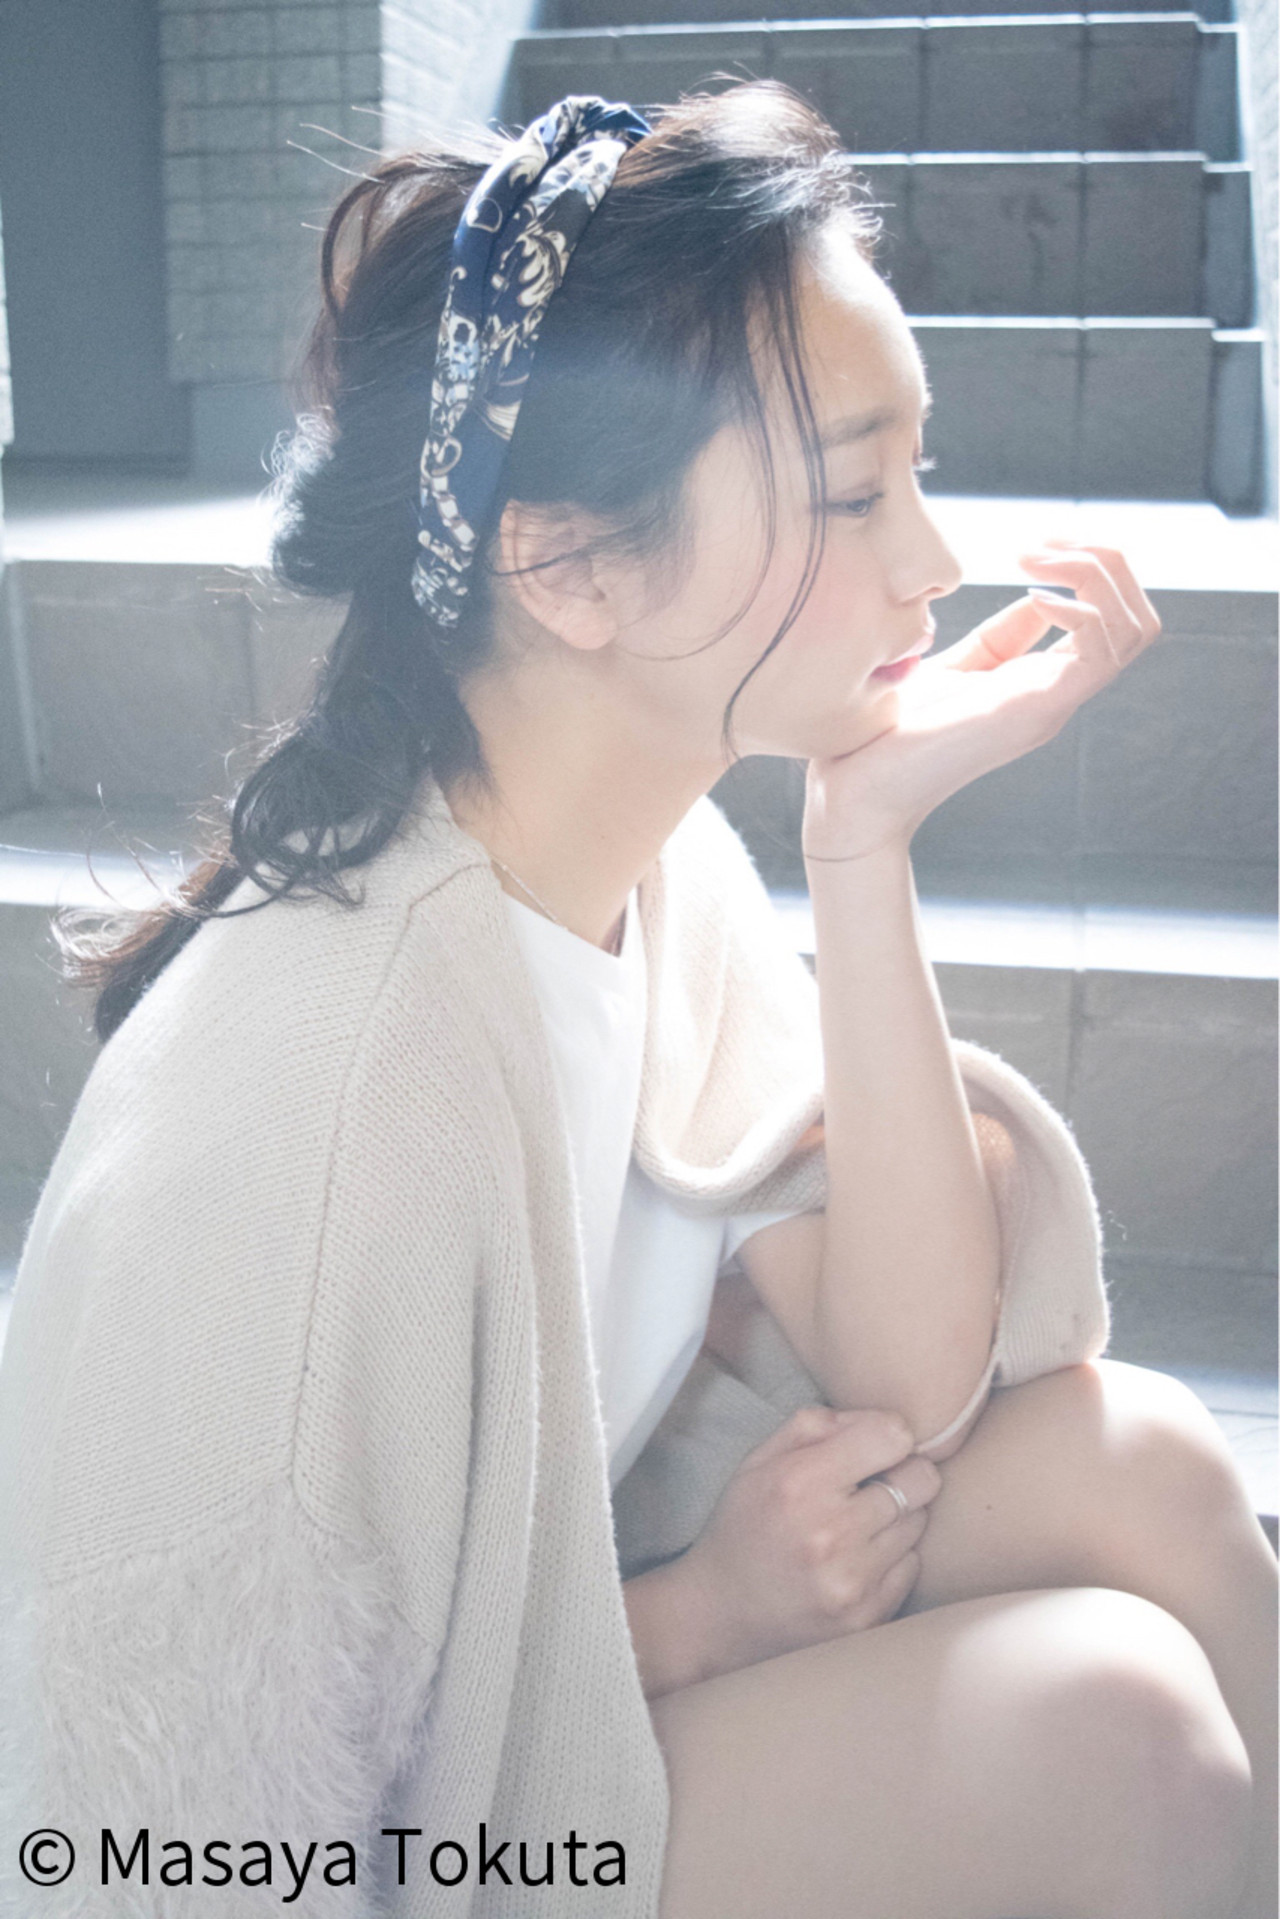 Masaya Tokuta